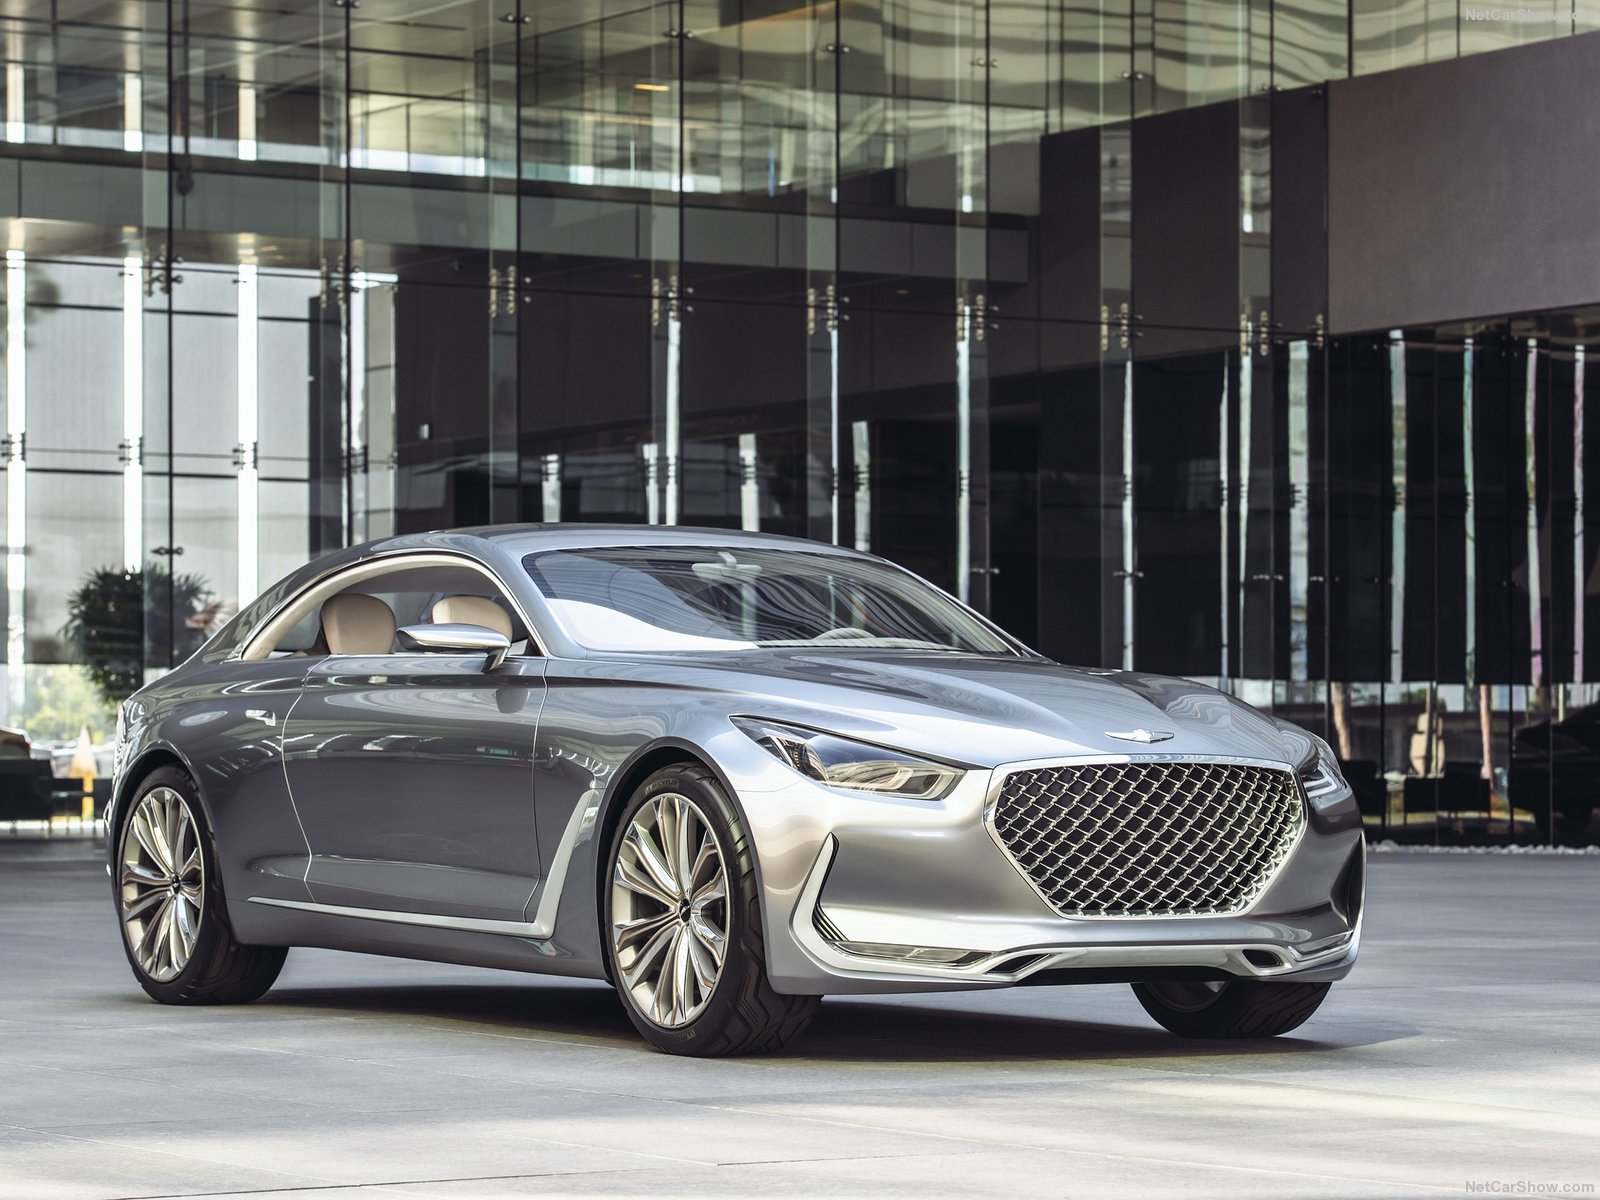 Genesis Luxury Brand Will Fully Embrace Its Hyundai Ties Not Ashamed Of Its Origins Autoevolution